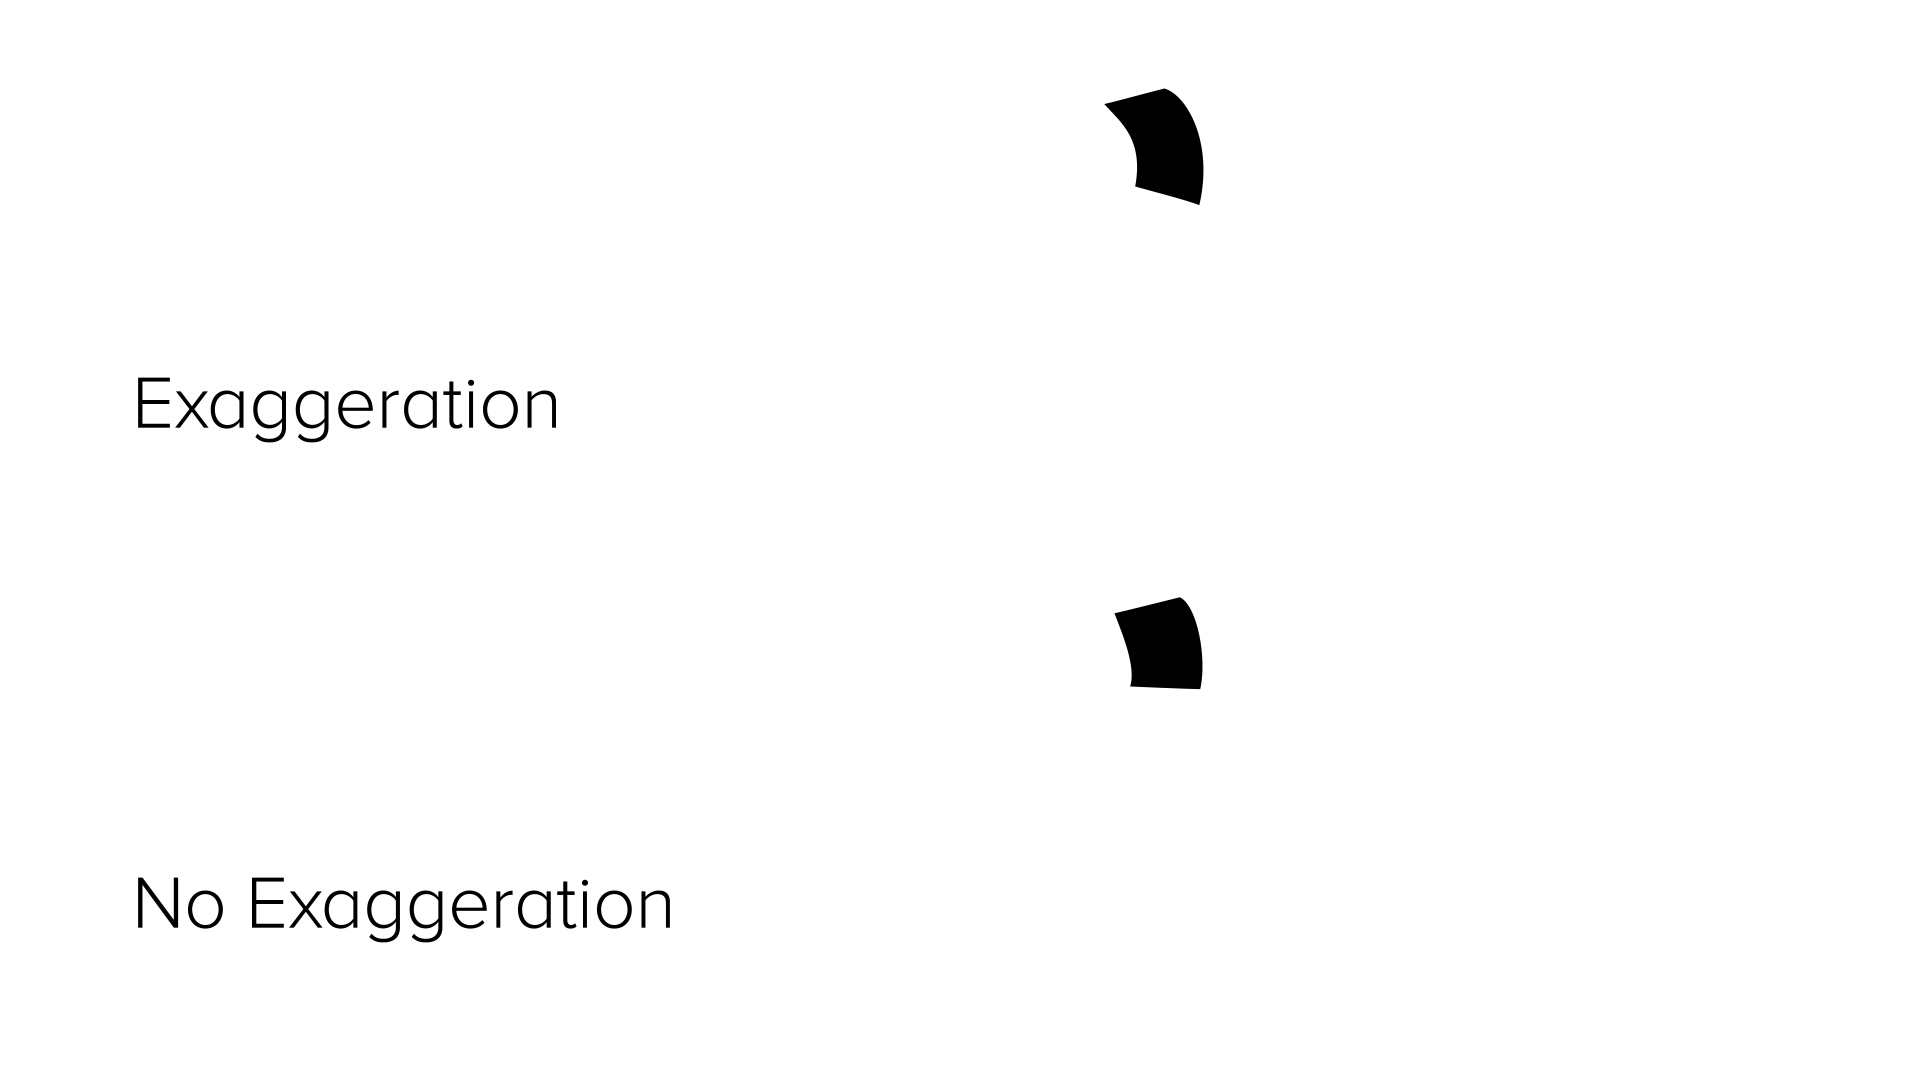 8-Principles-Motion-Design-Exaggeration-VMG-Studios